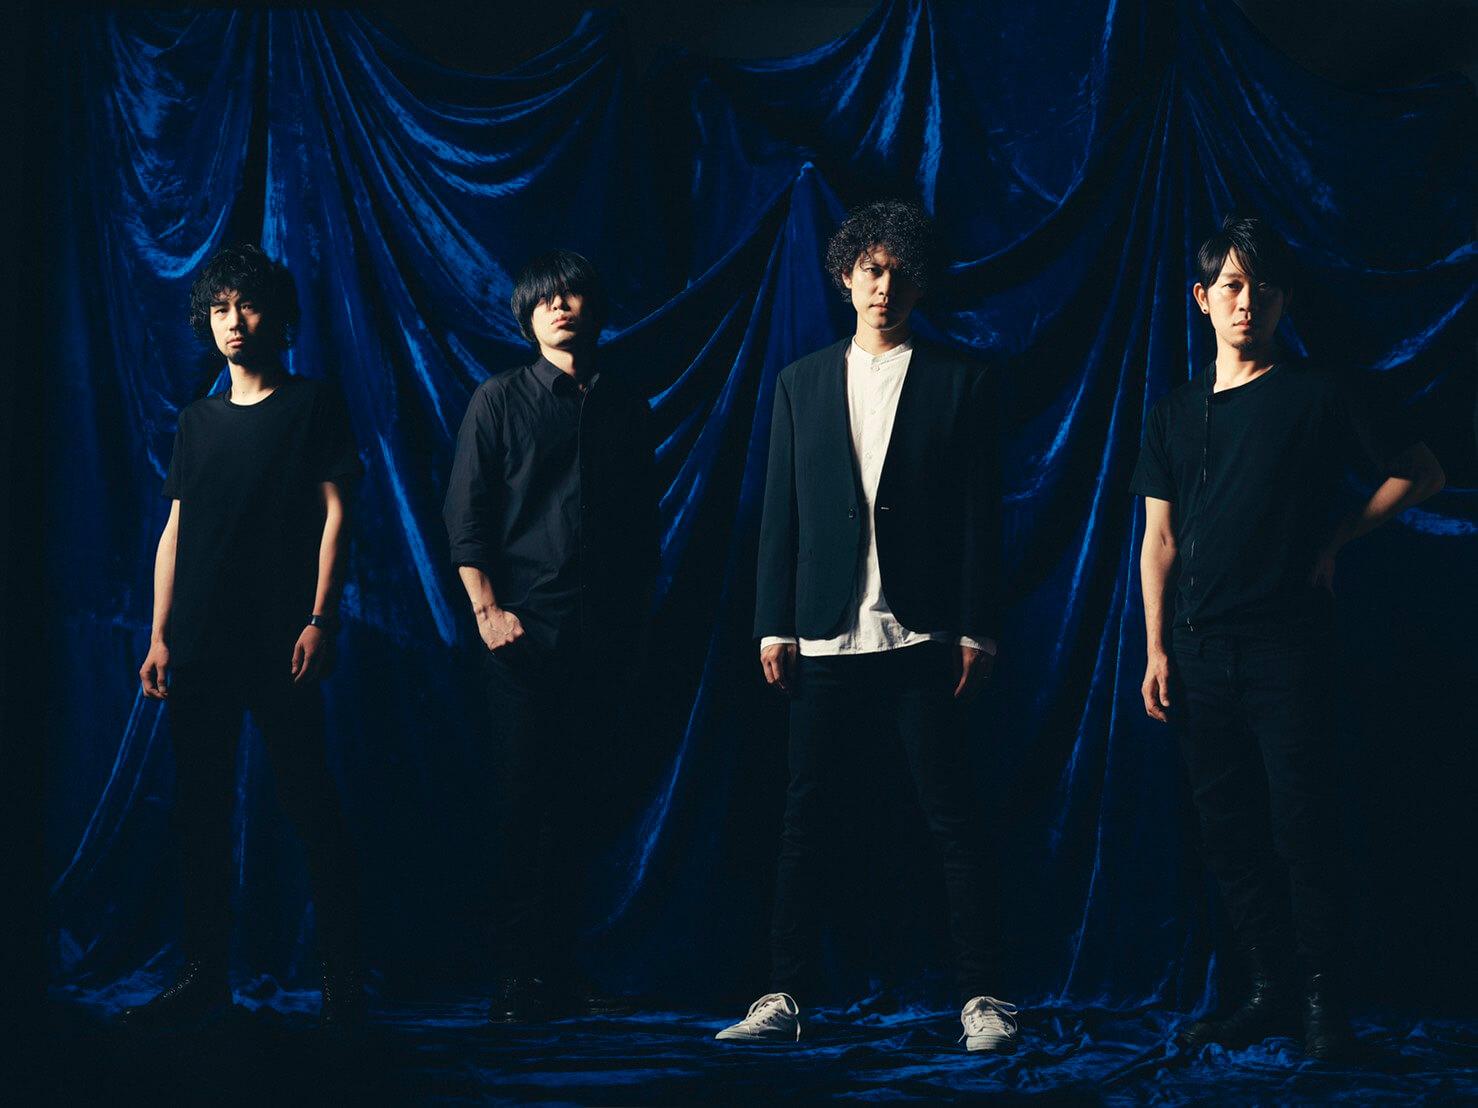 9mm Parabellum Bullet、8thアルバム「DEEP BLUE」をリリースサムネイル画像